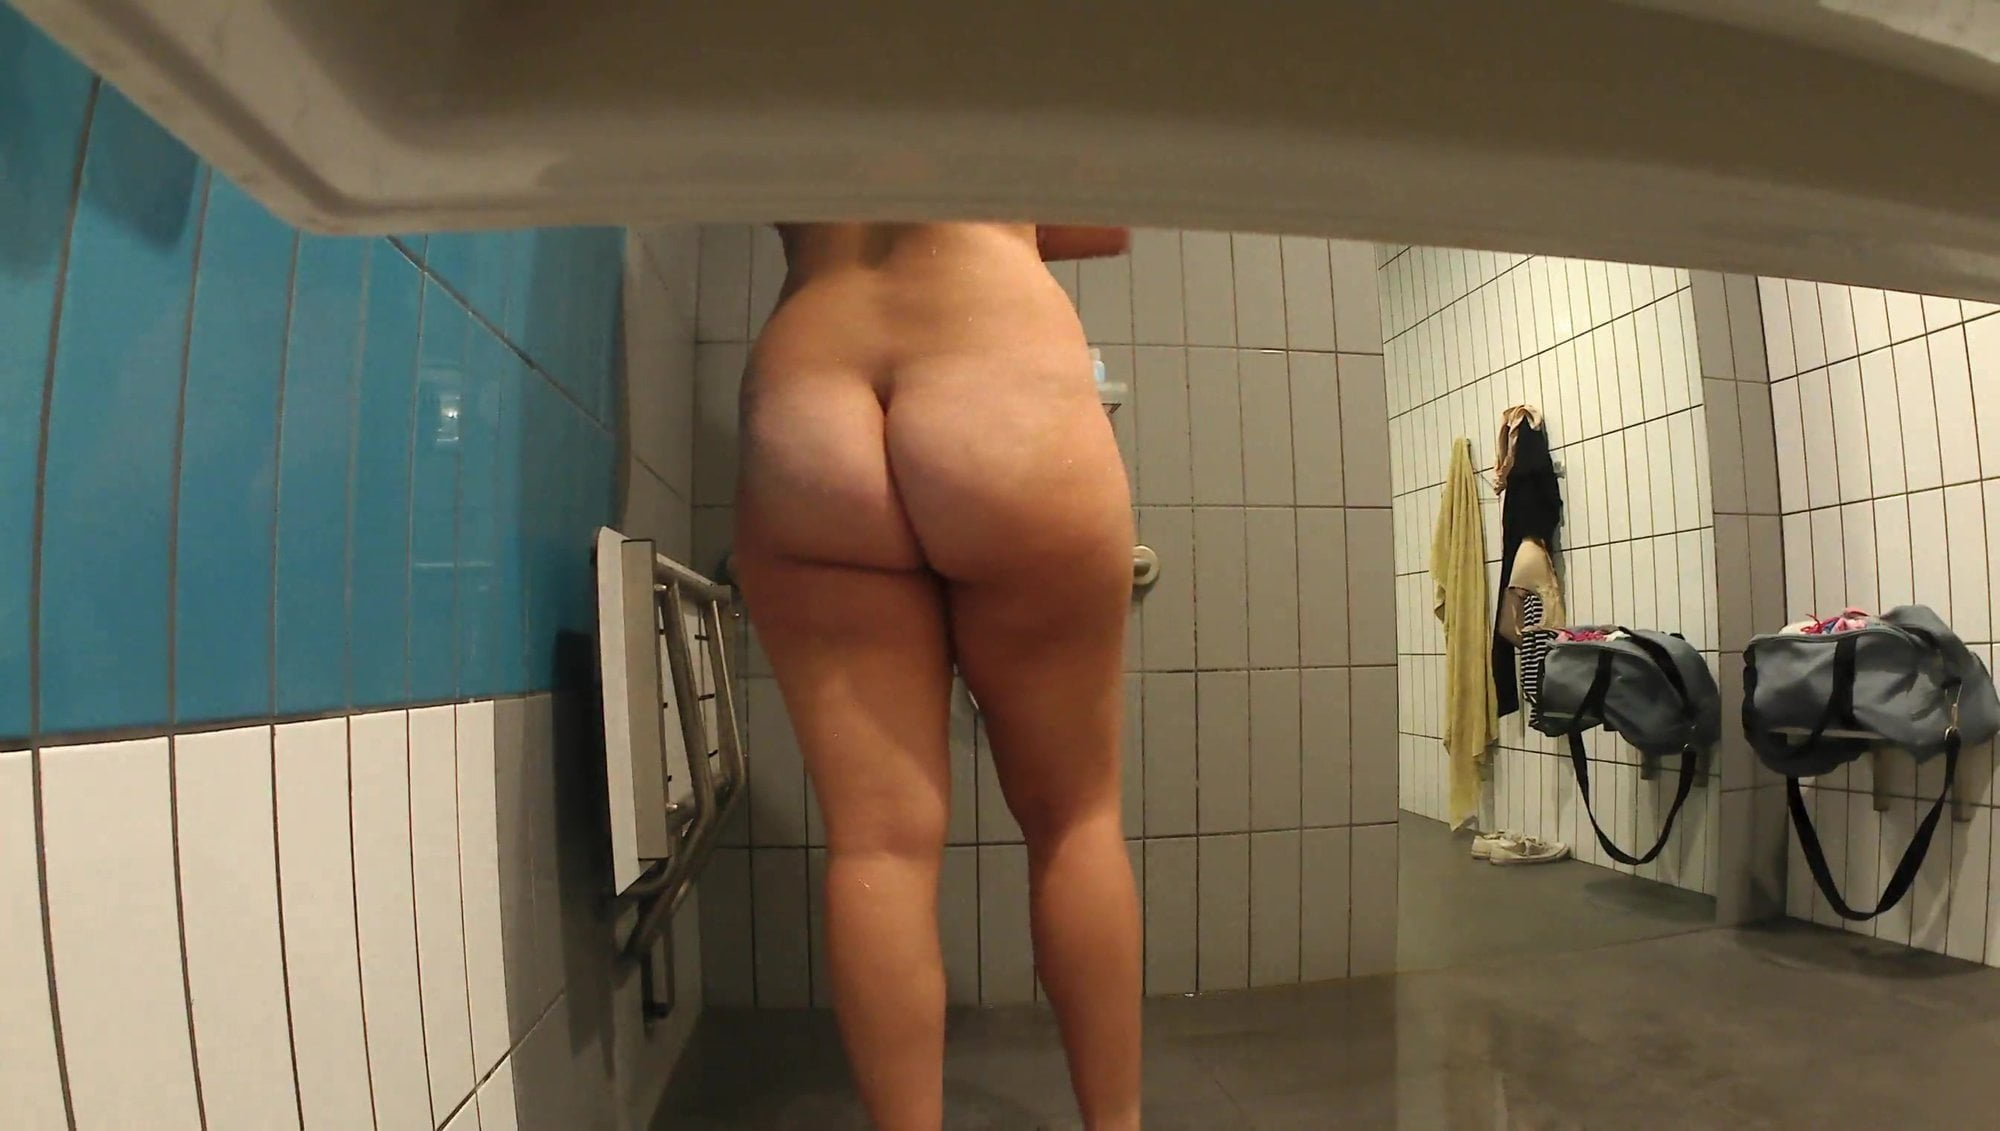 Aussie Browser Porn spying on thick aussie chick in shower